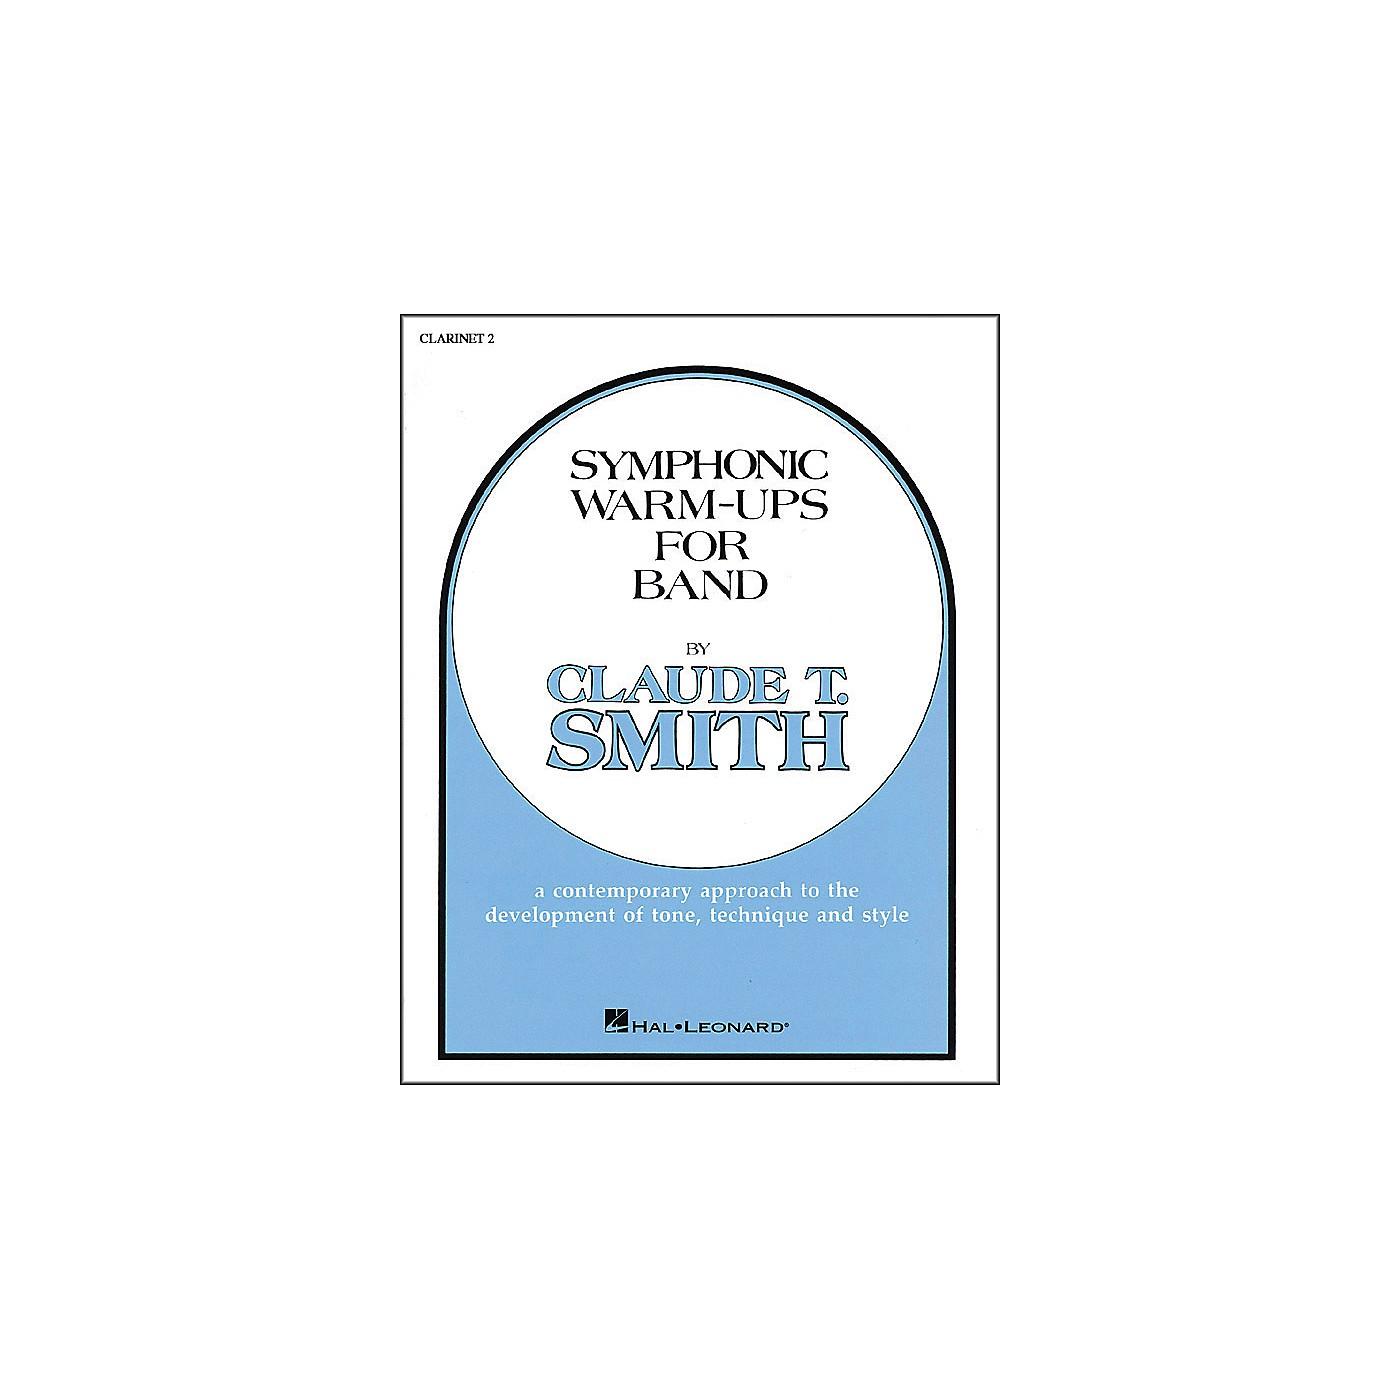 Hal Leonard Symphonic Warm-Ups For Band For B Flat Clarinet 2 thumbnail